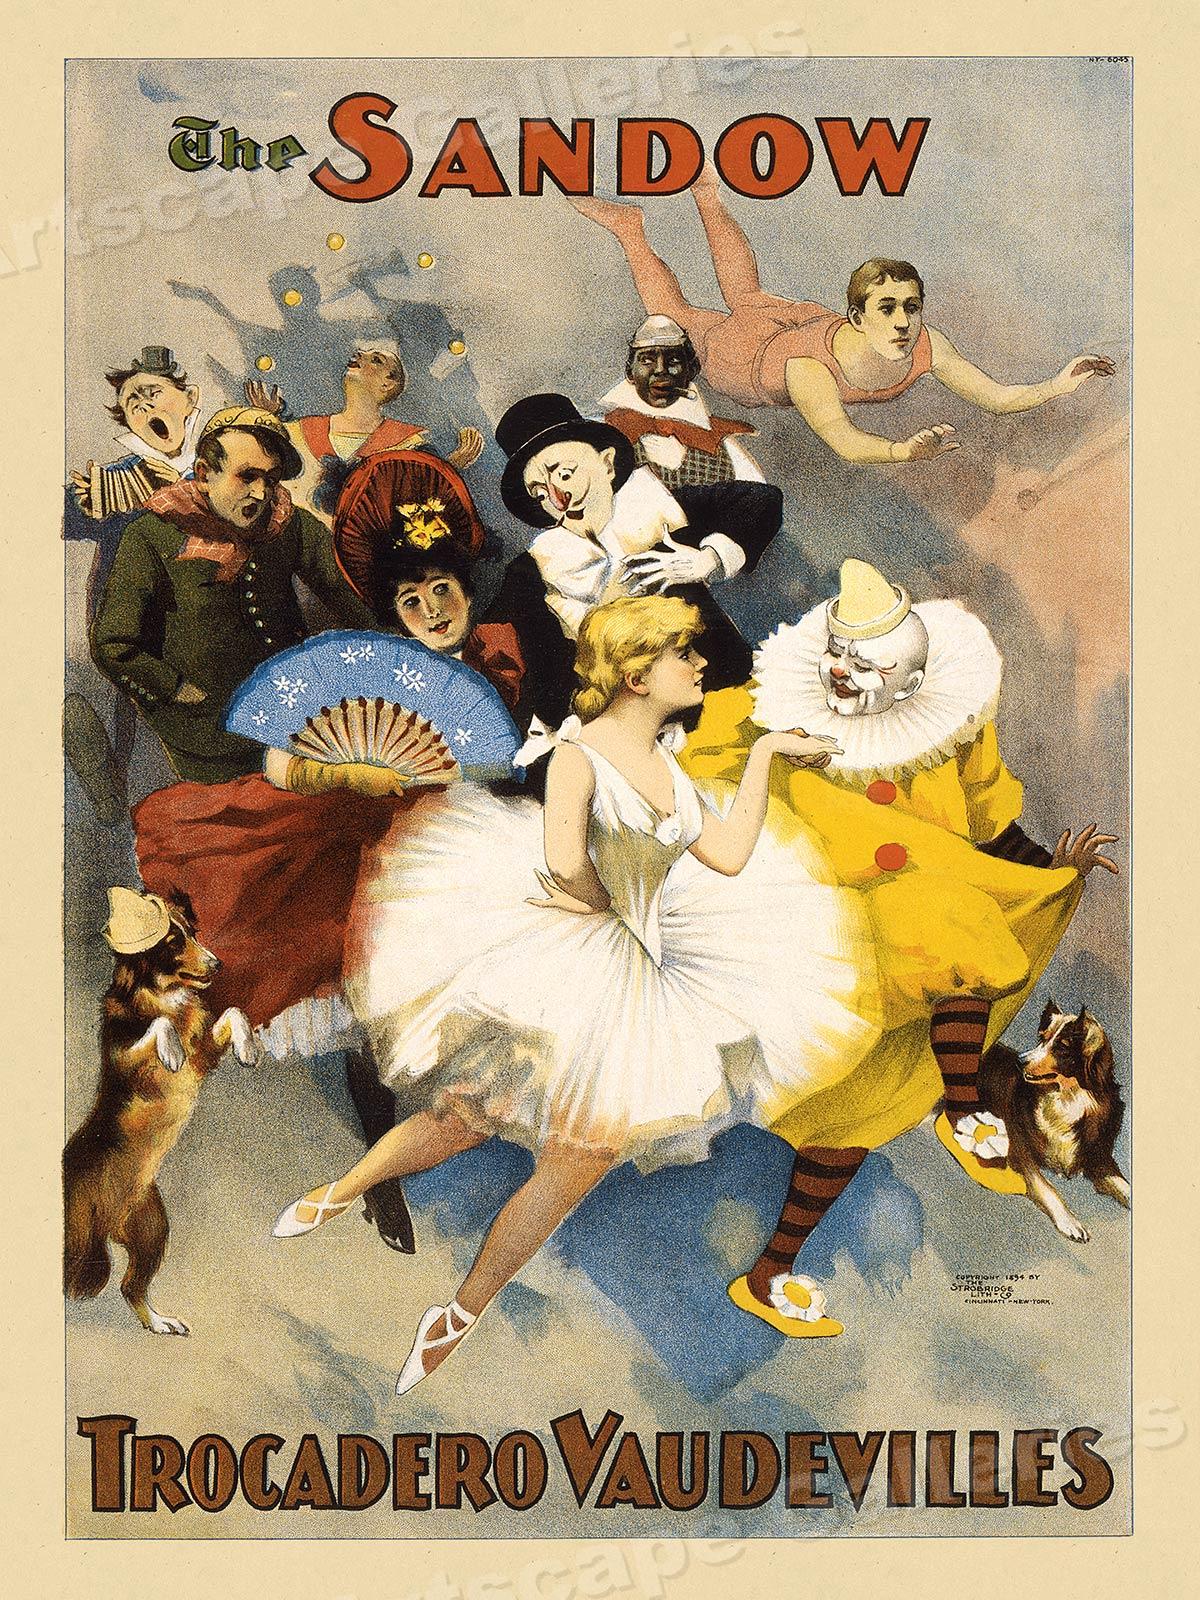 The Sandow Vaudeville Circus 1894 Poster Trocadero Vaudevilles